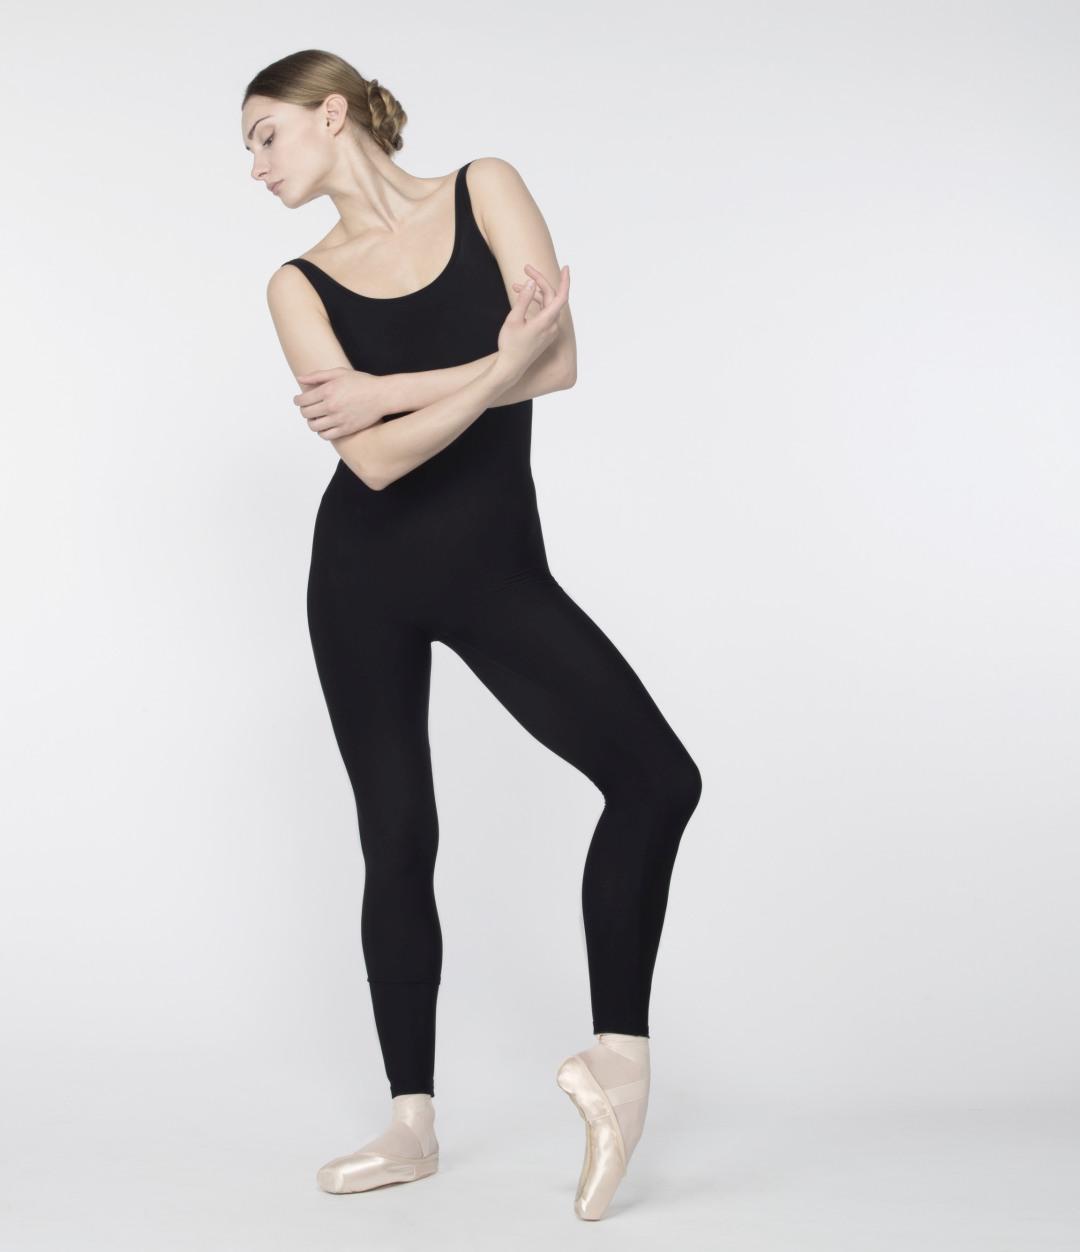 Одежда для танца afd8296d0ef